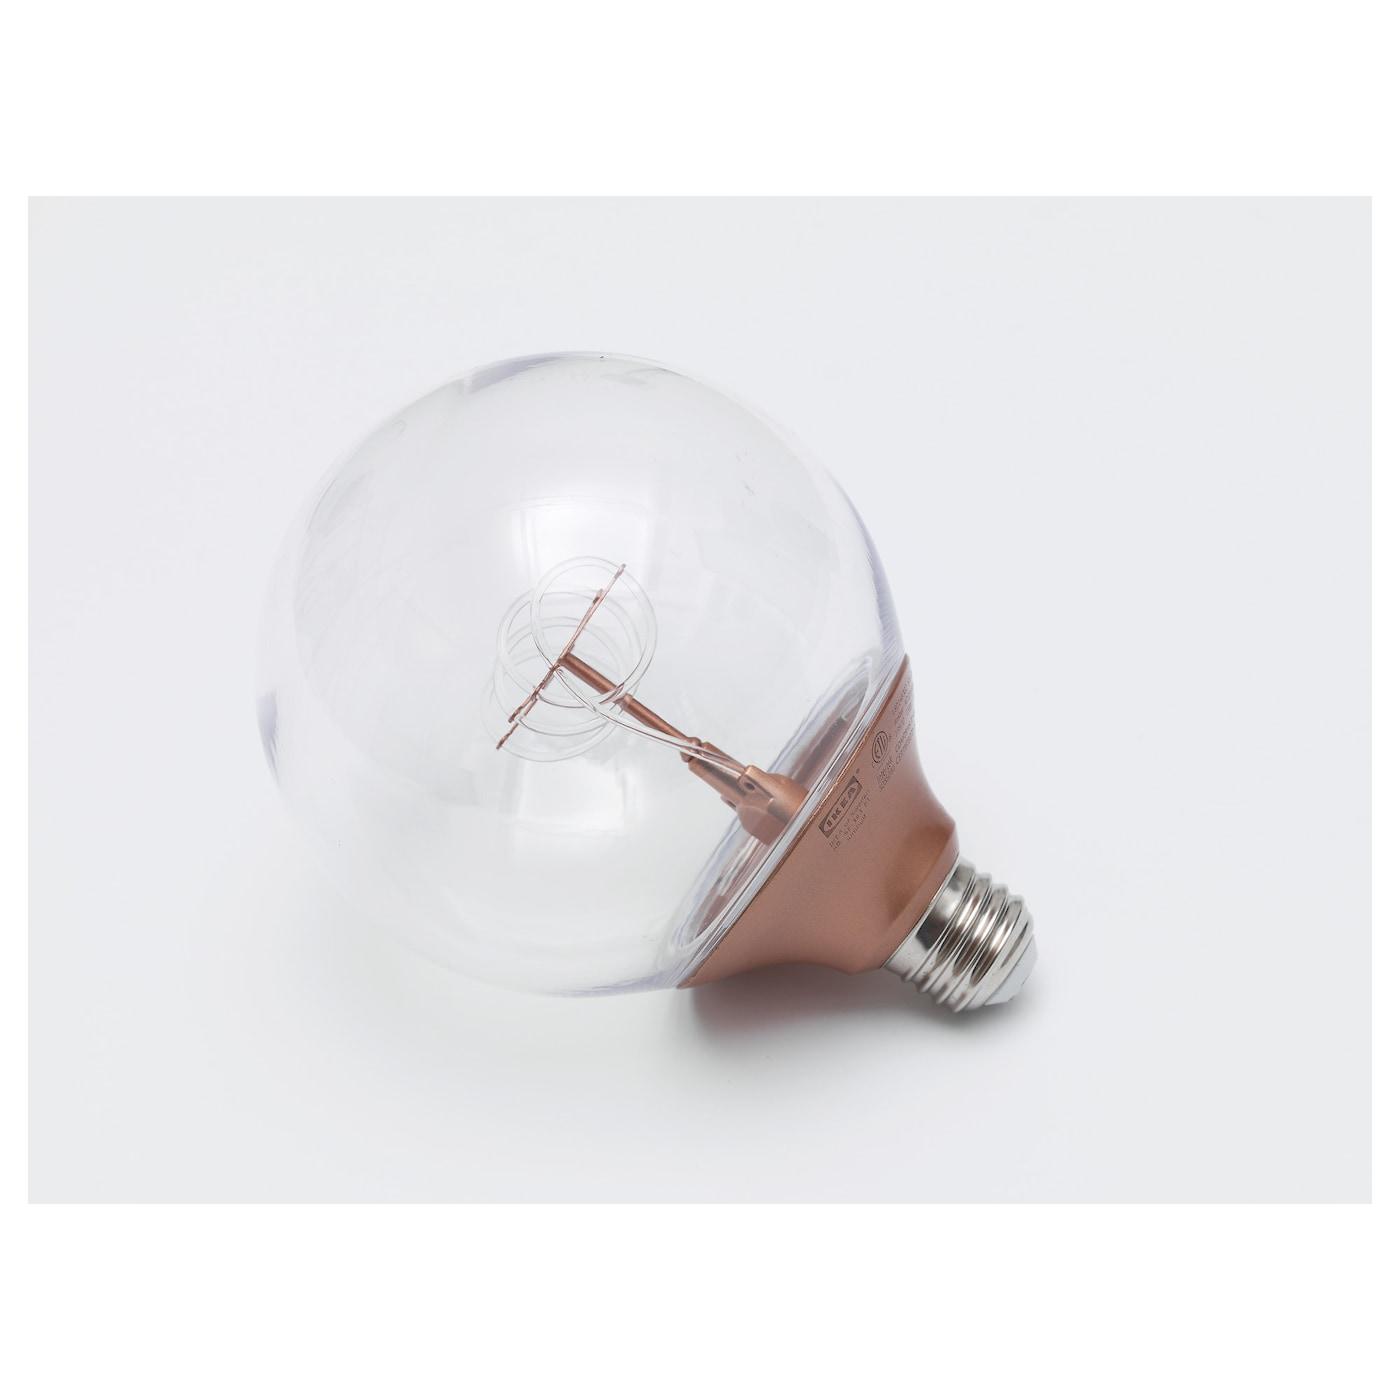 globus baumarkt 20 prozent lampen